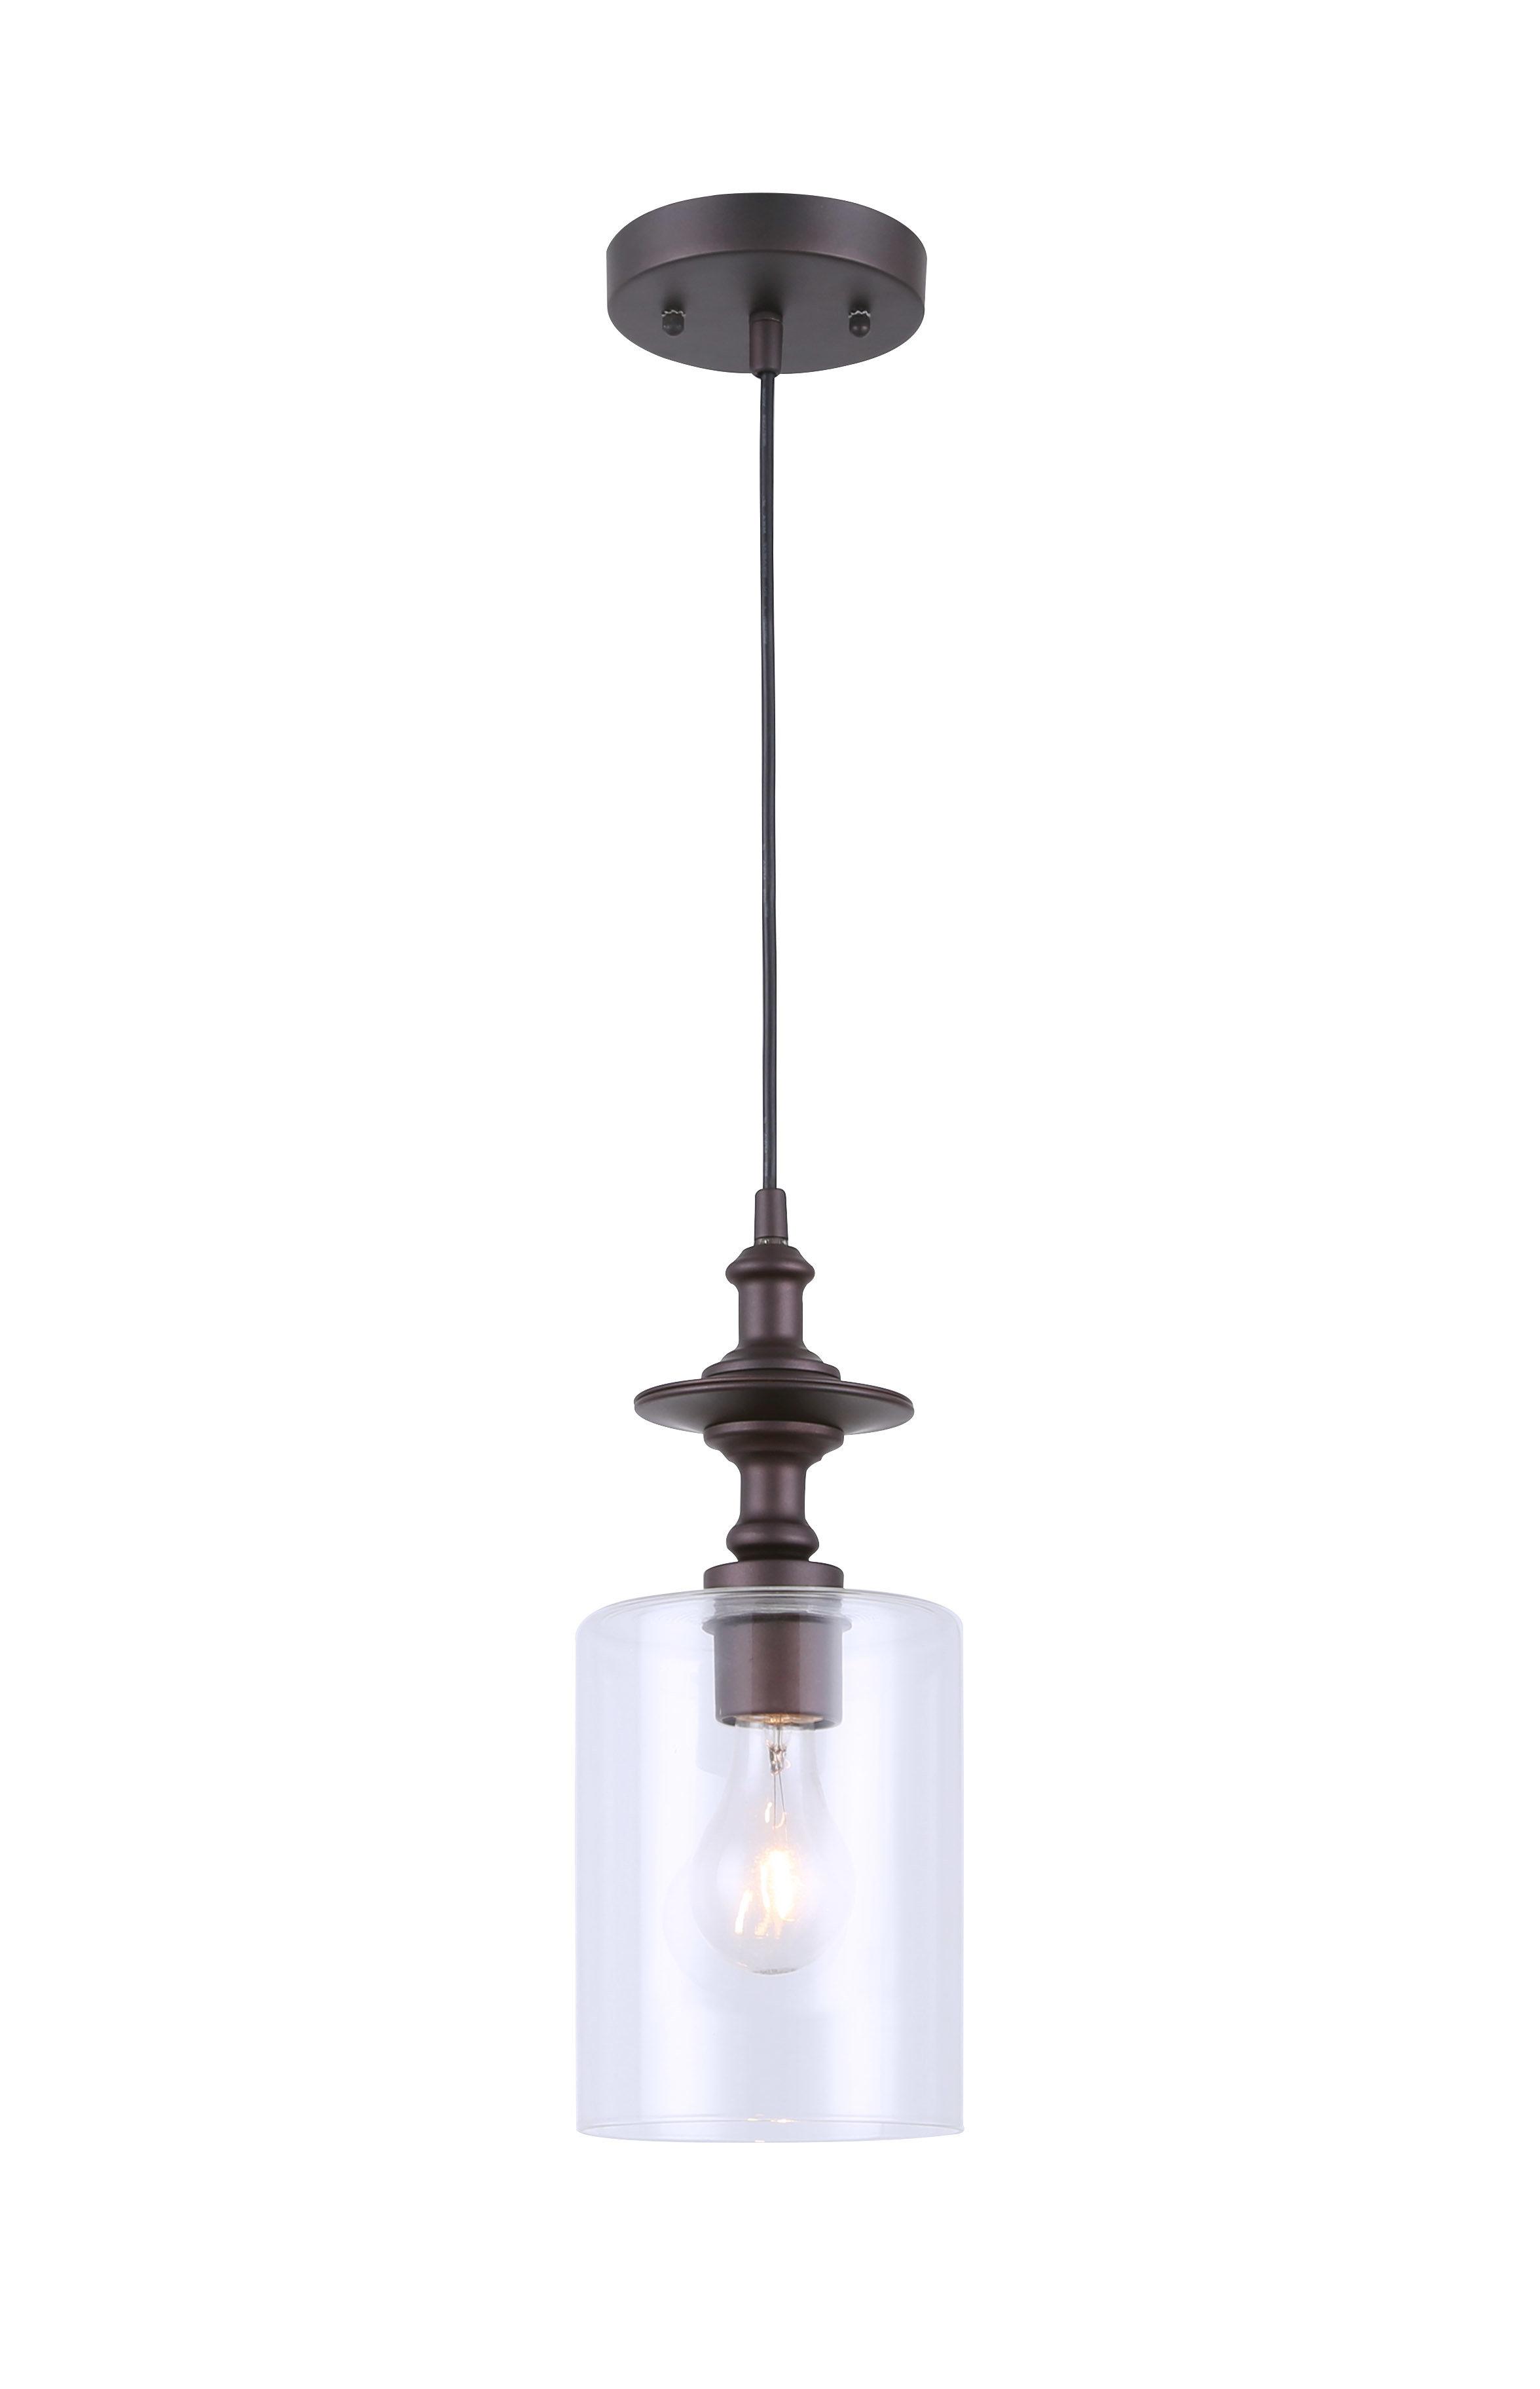 Popular Photo of Moyer 1 Light Single Cylinder Pendants